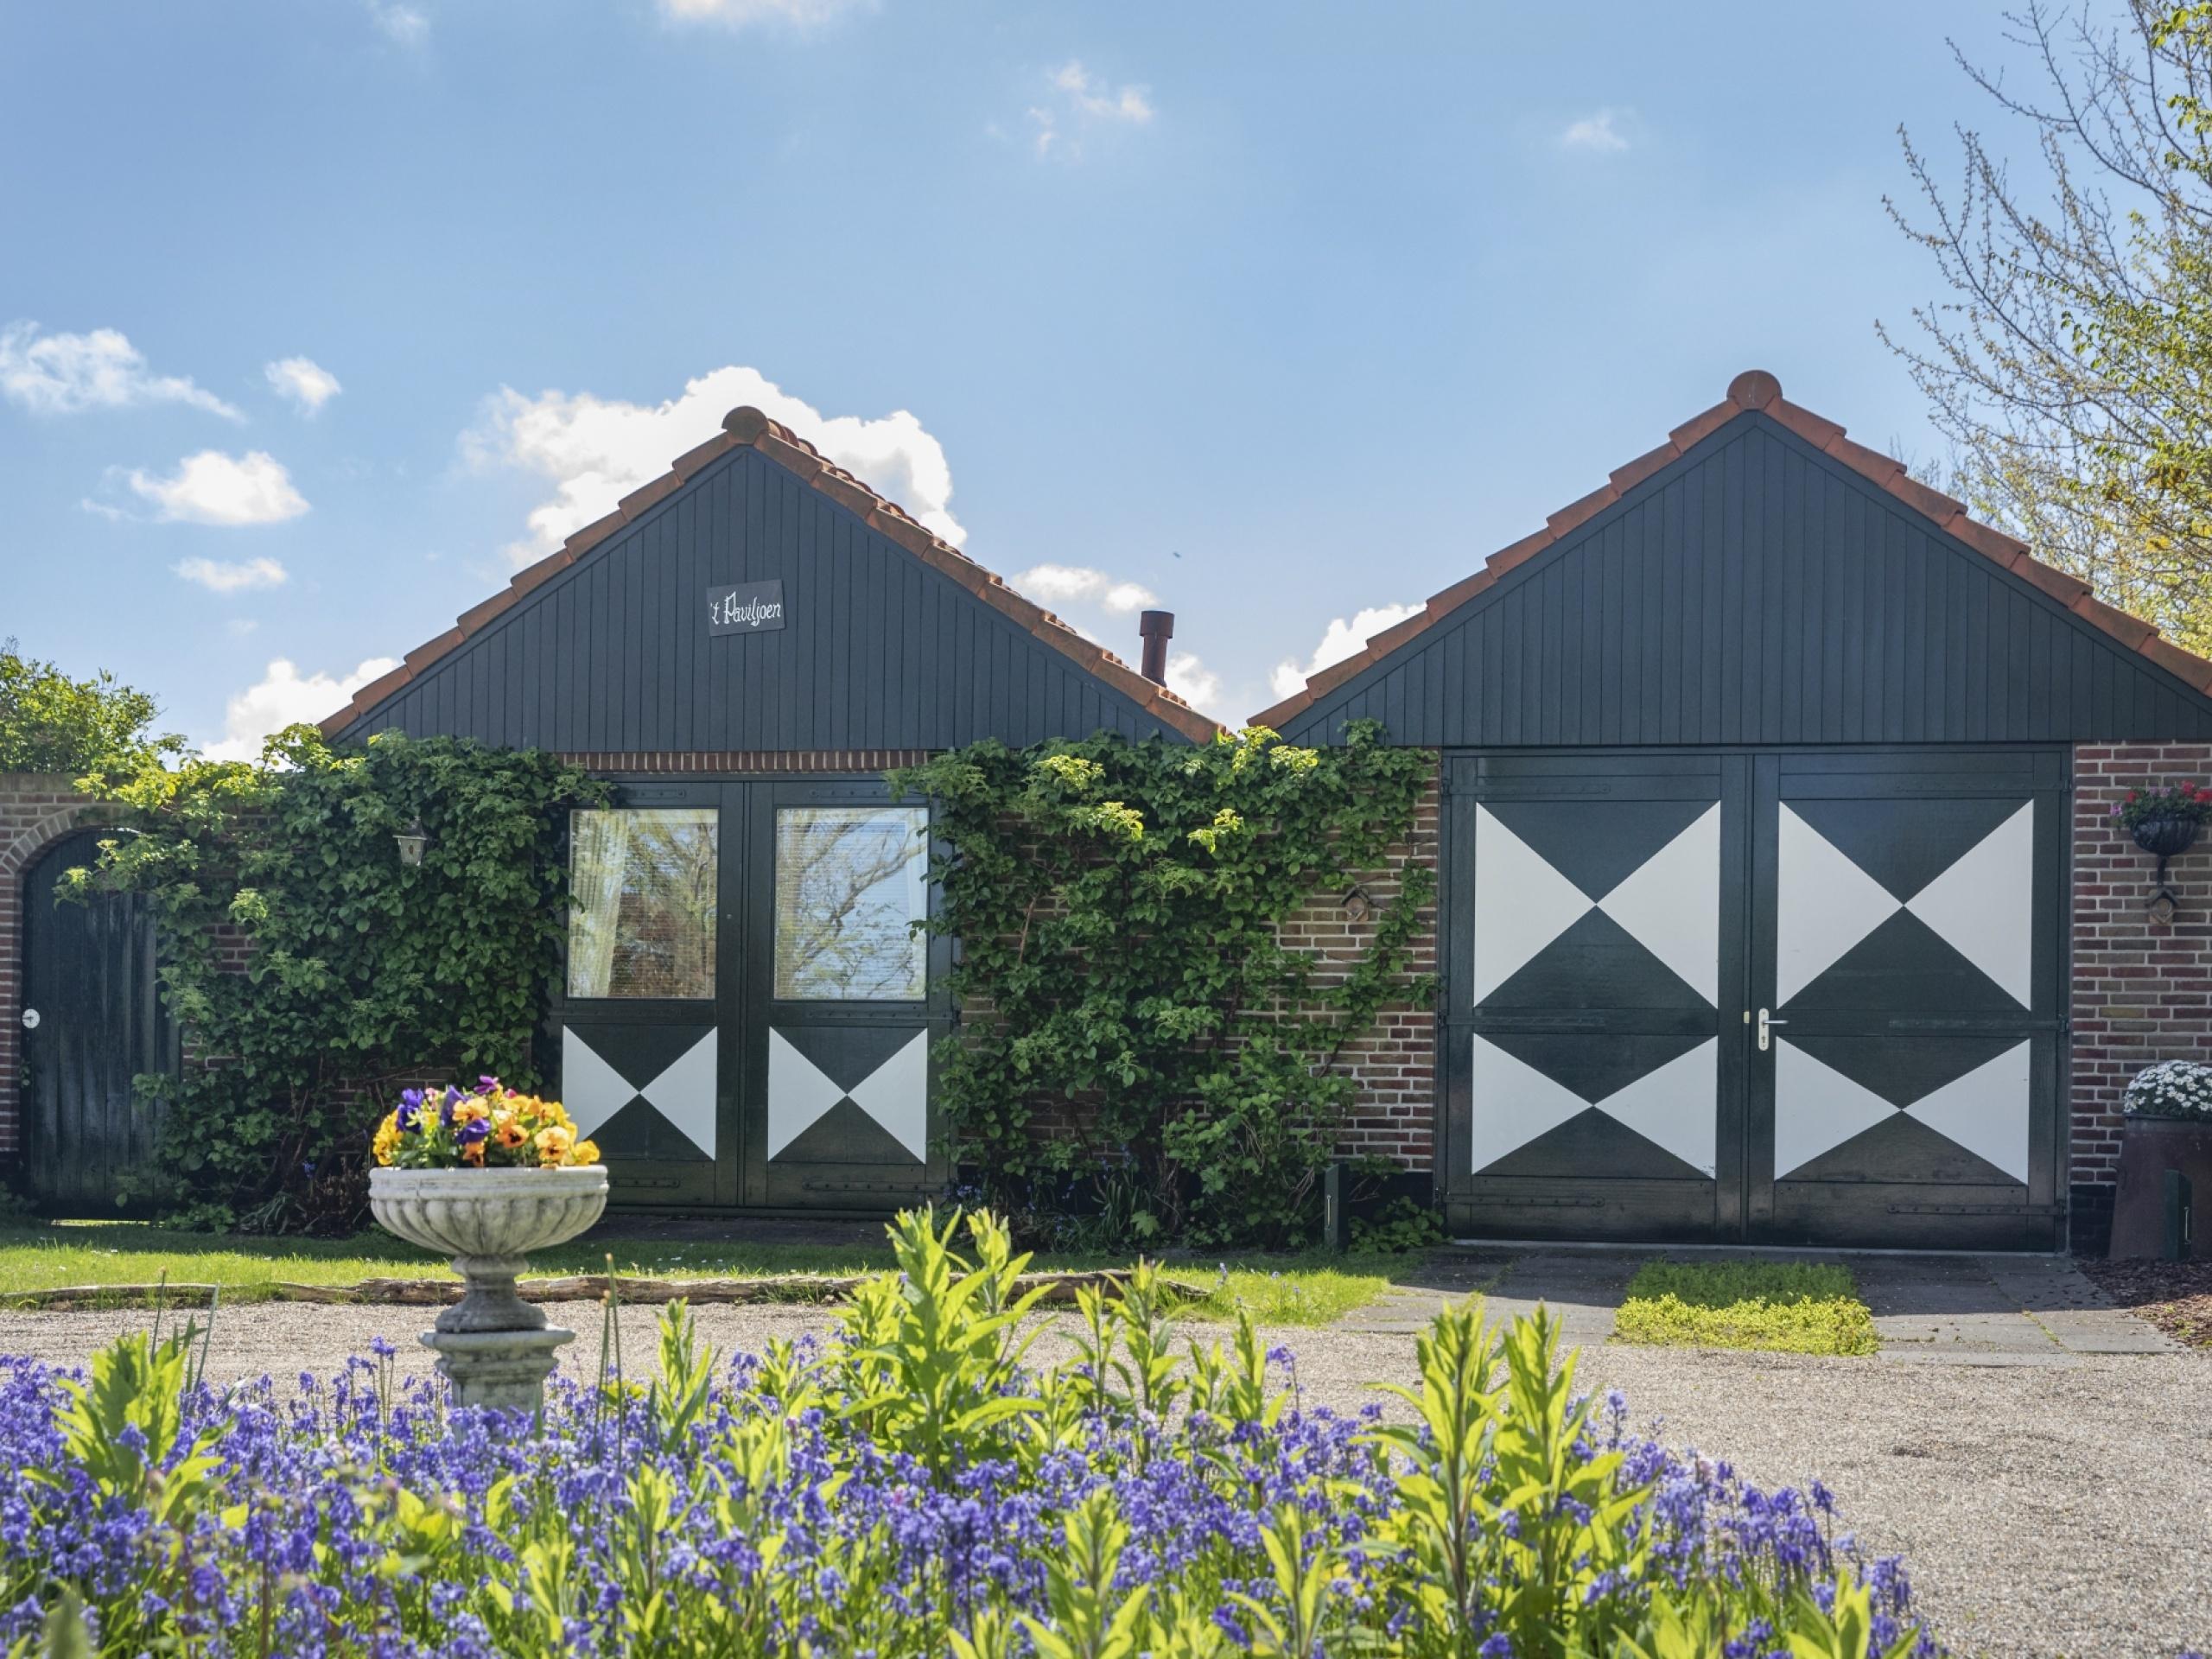 Studio at De Koog with a nice view